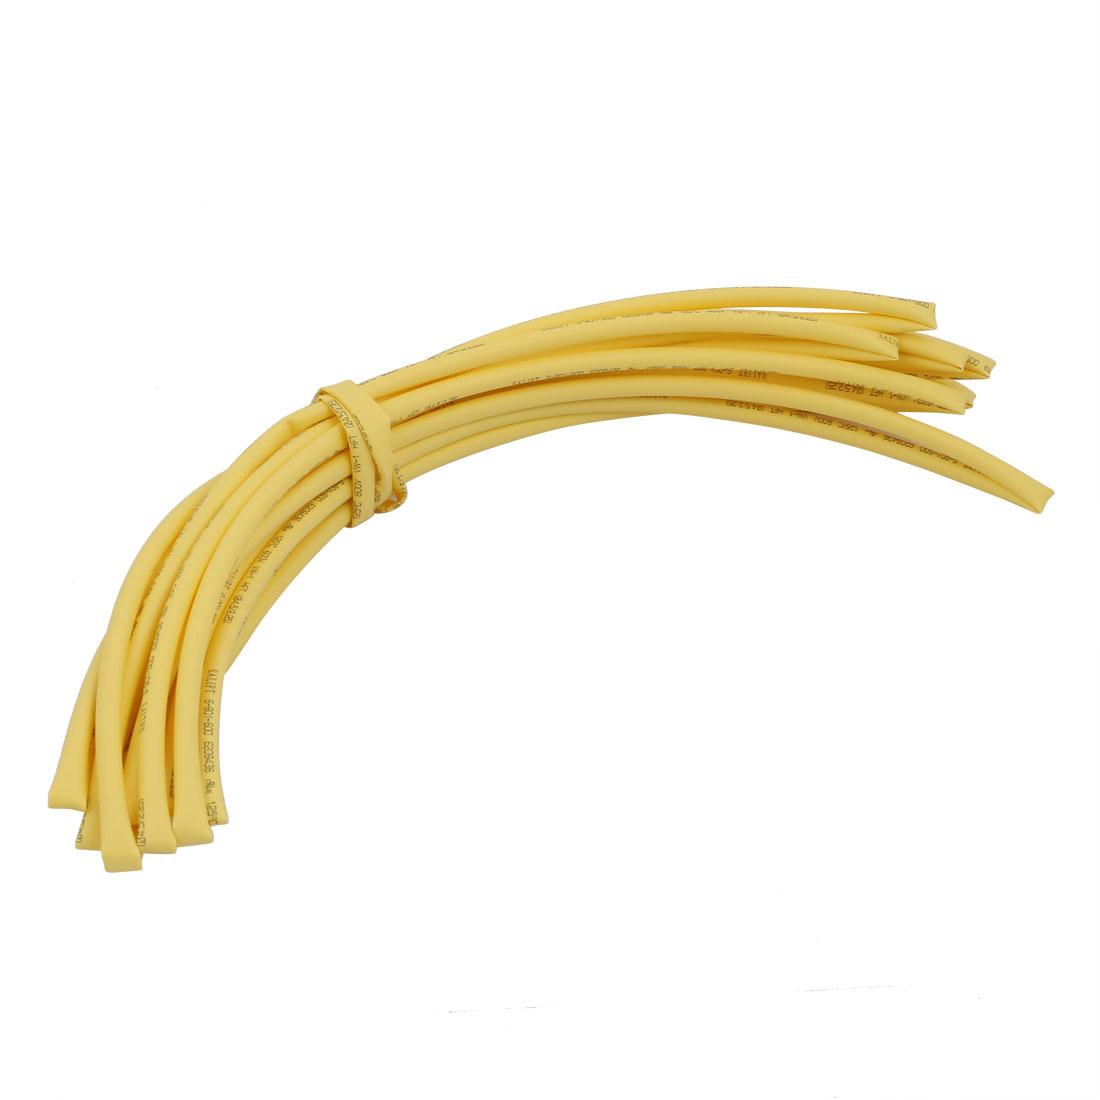 6M 0.18in Inner Dia Polyolefin Flame Retardant Tube Yellow for Wire Repairing